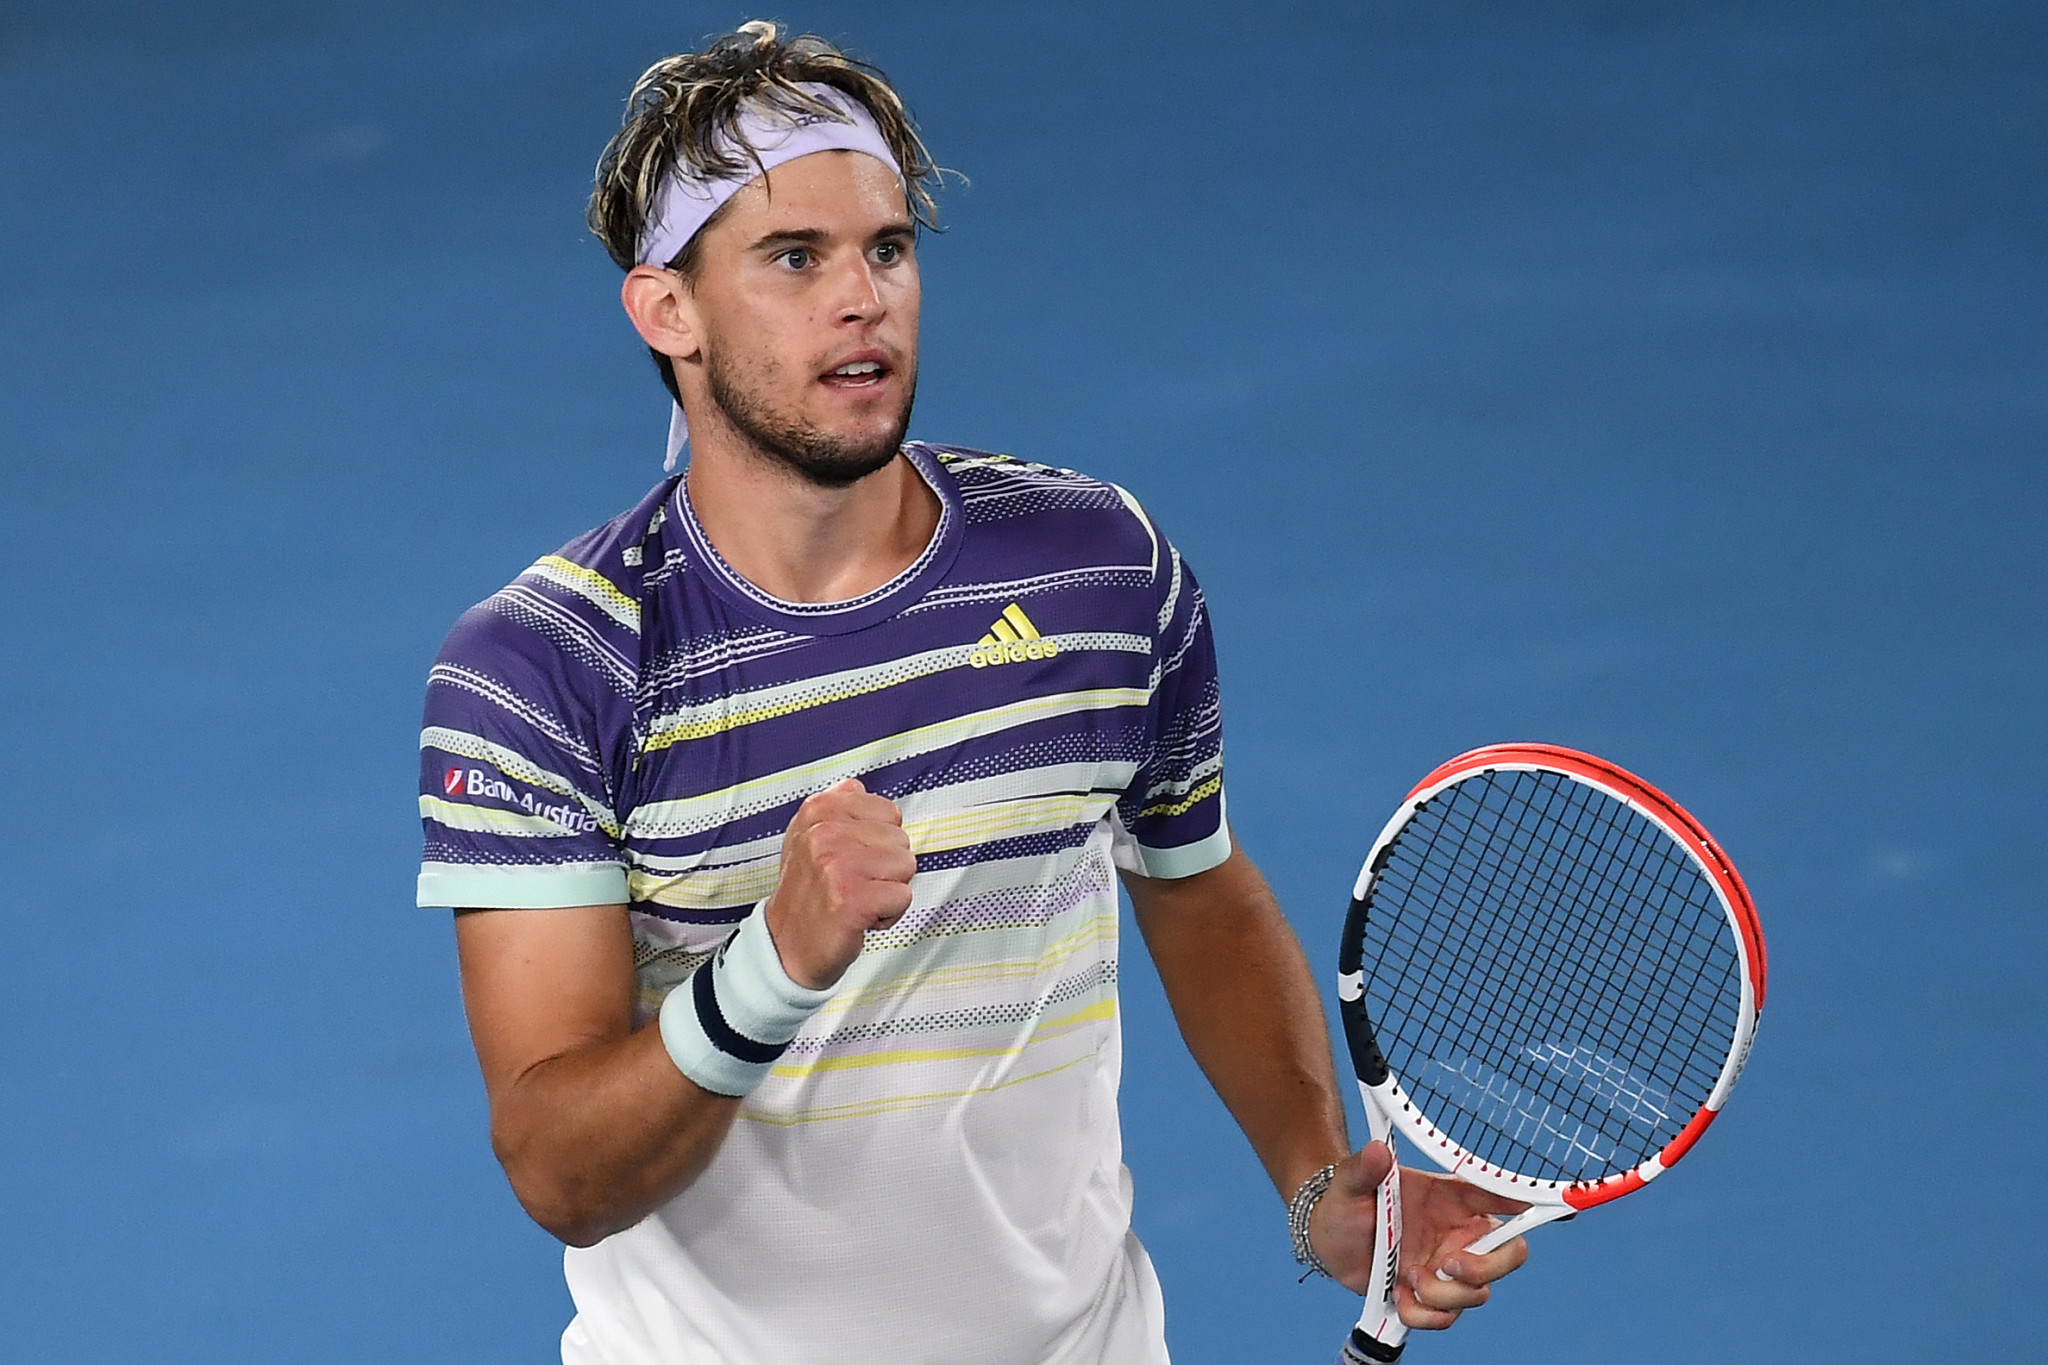 Thiem battles back against Zverev to book place in Australian Open final